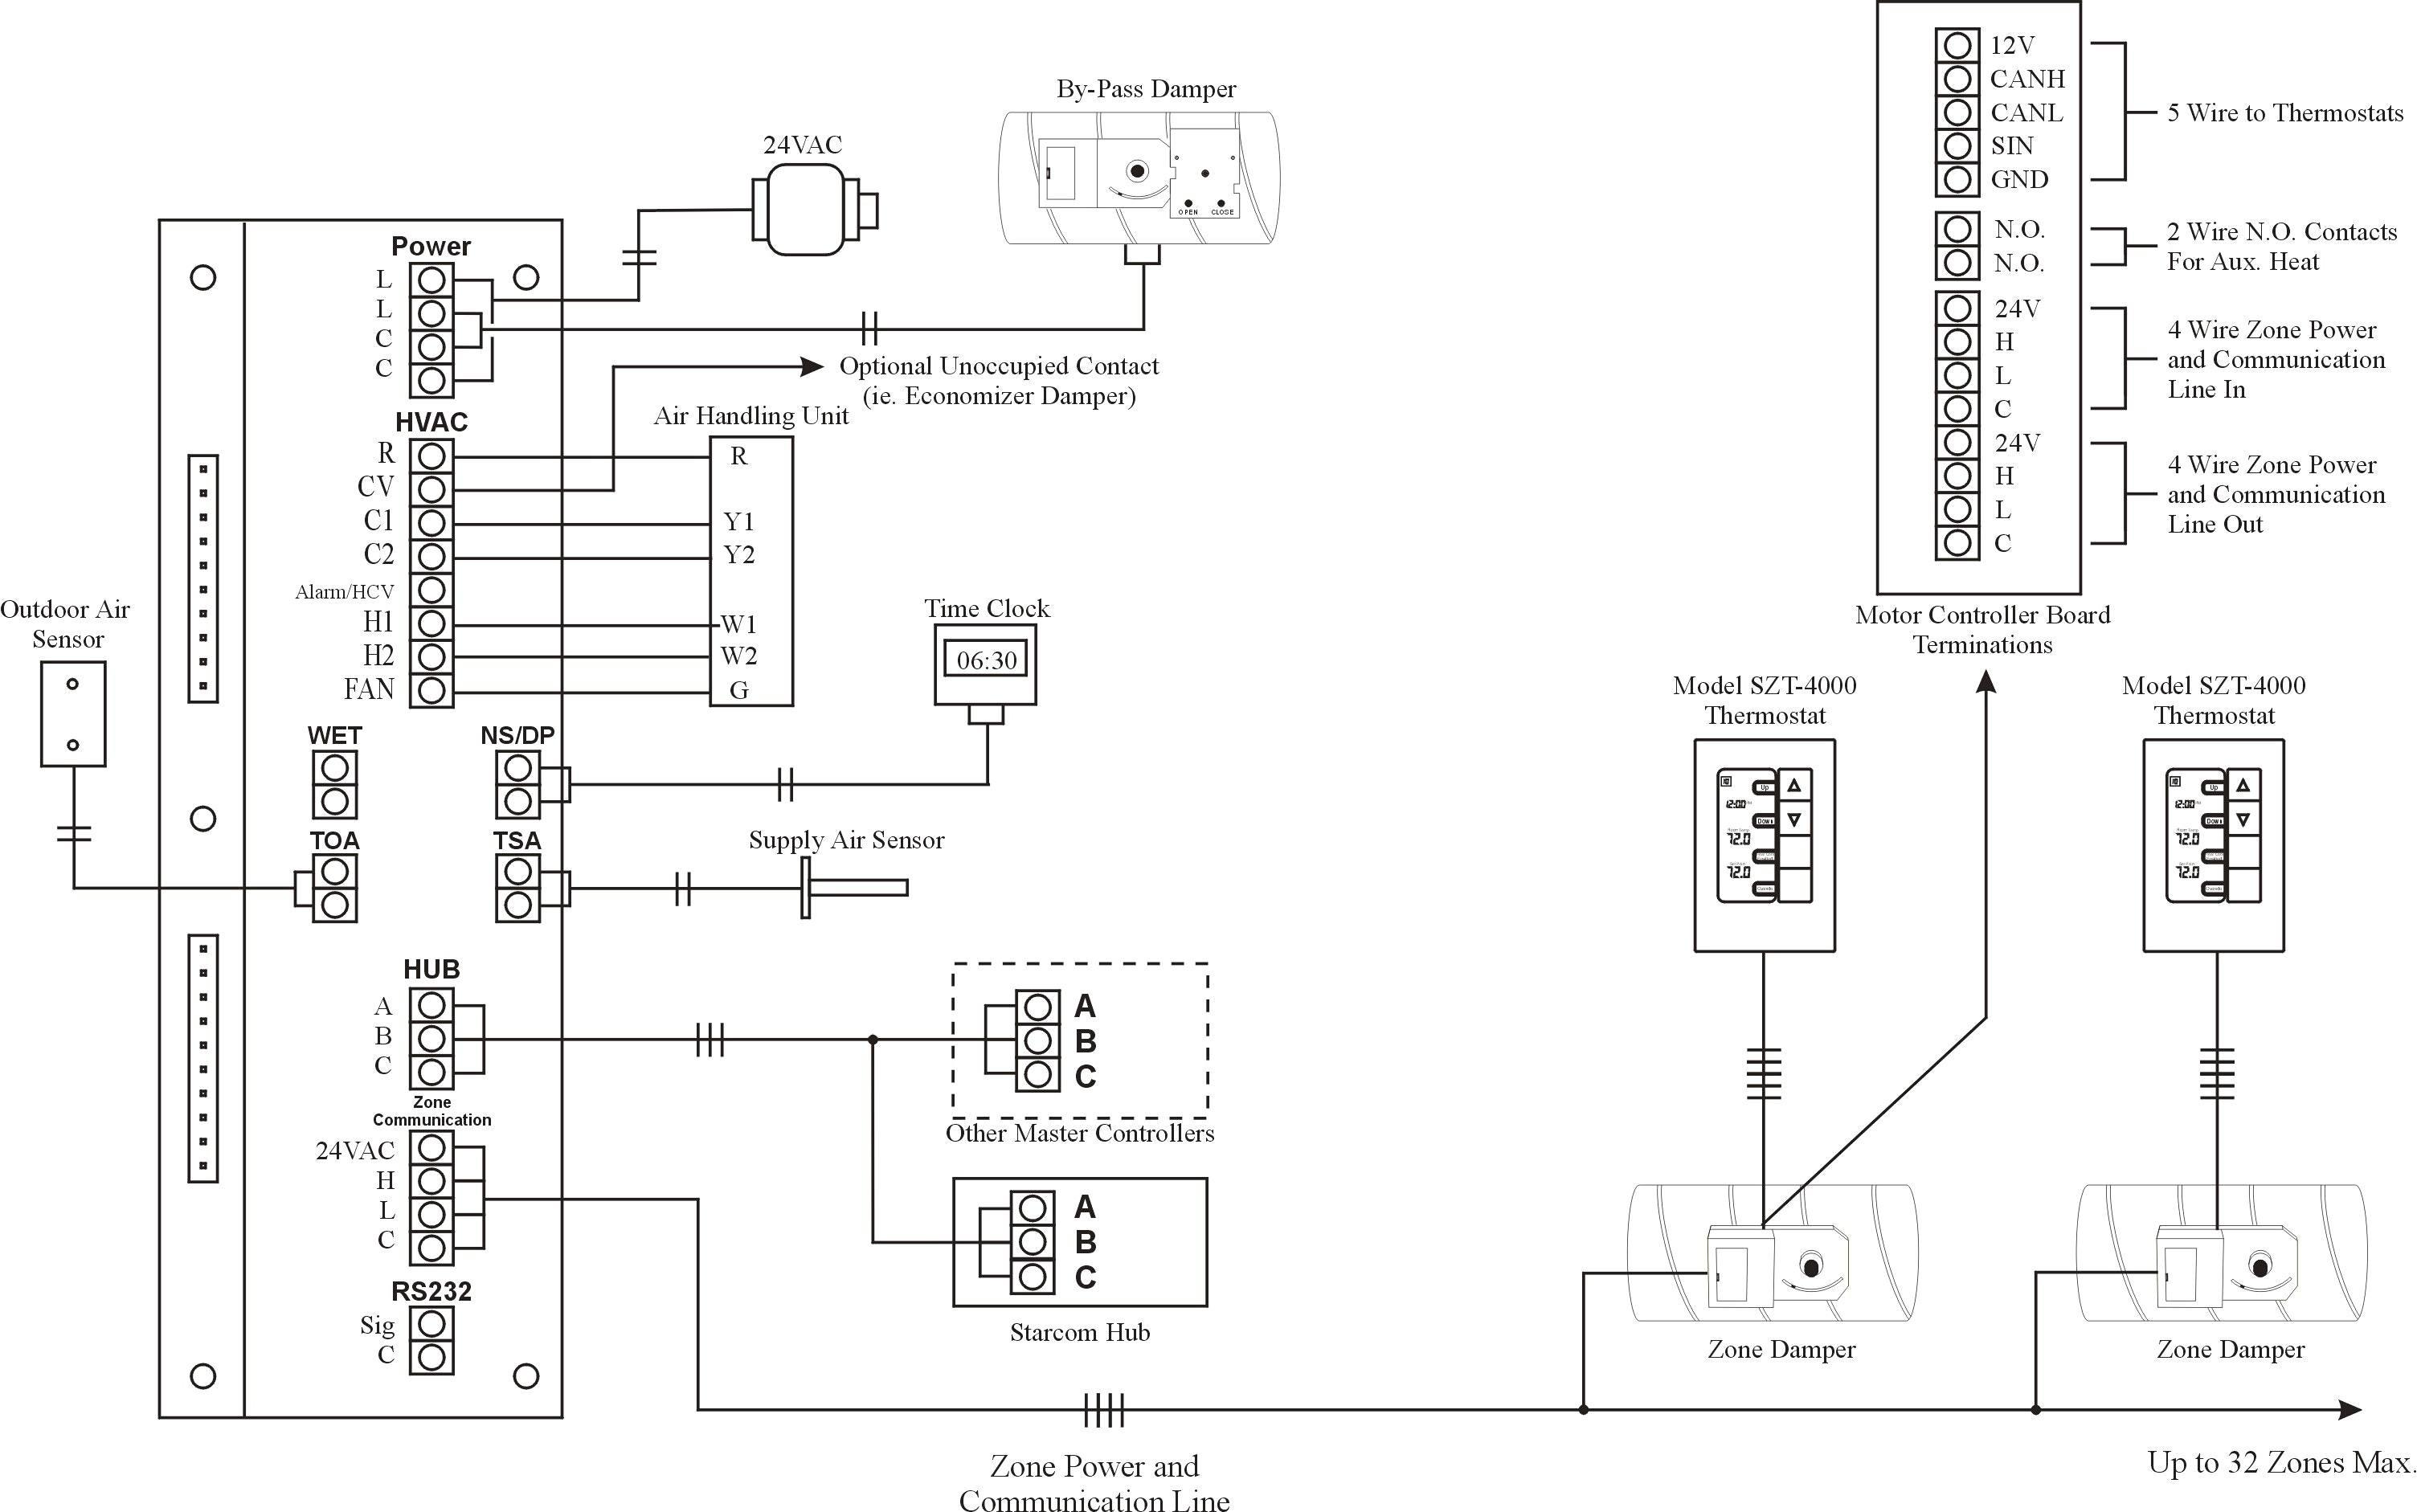 Fire Alarm Wiring Diagram Stunning Viper Alarm Wiring Diagram Everything You Need Of Fire Alarm Wiring Diagram